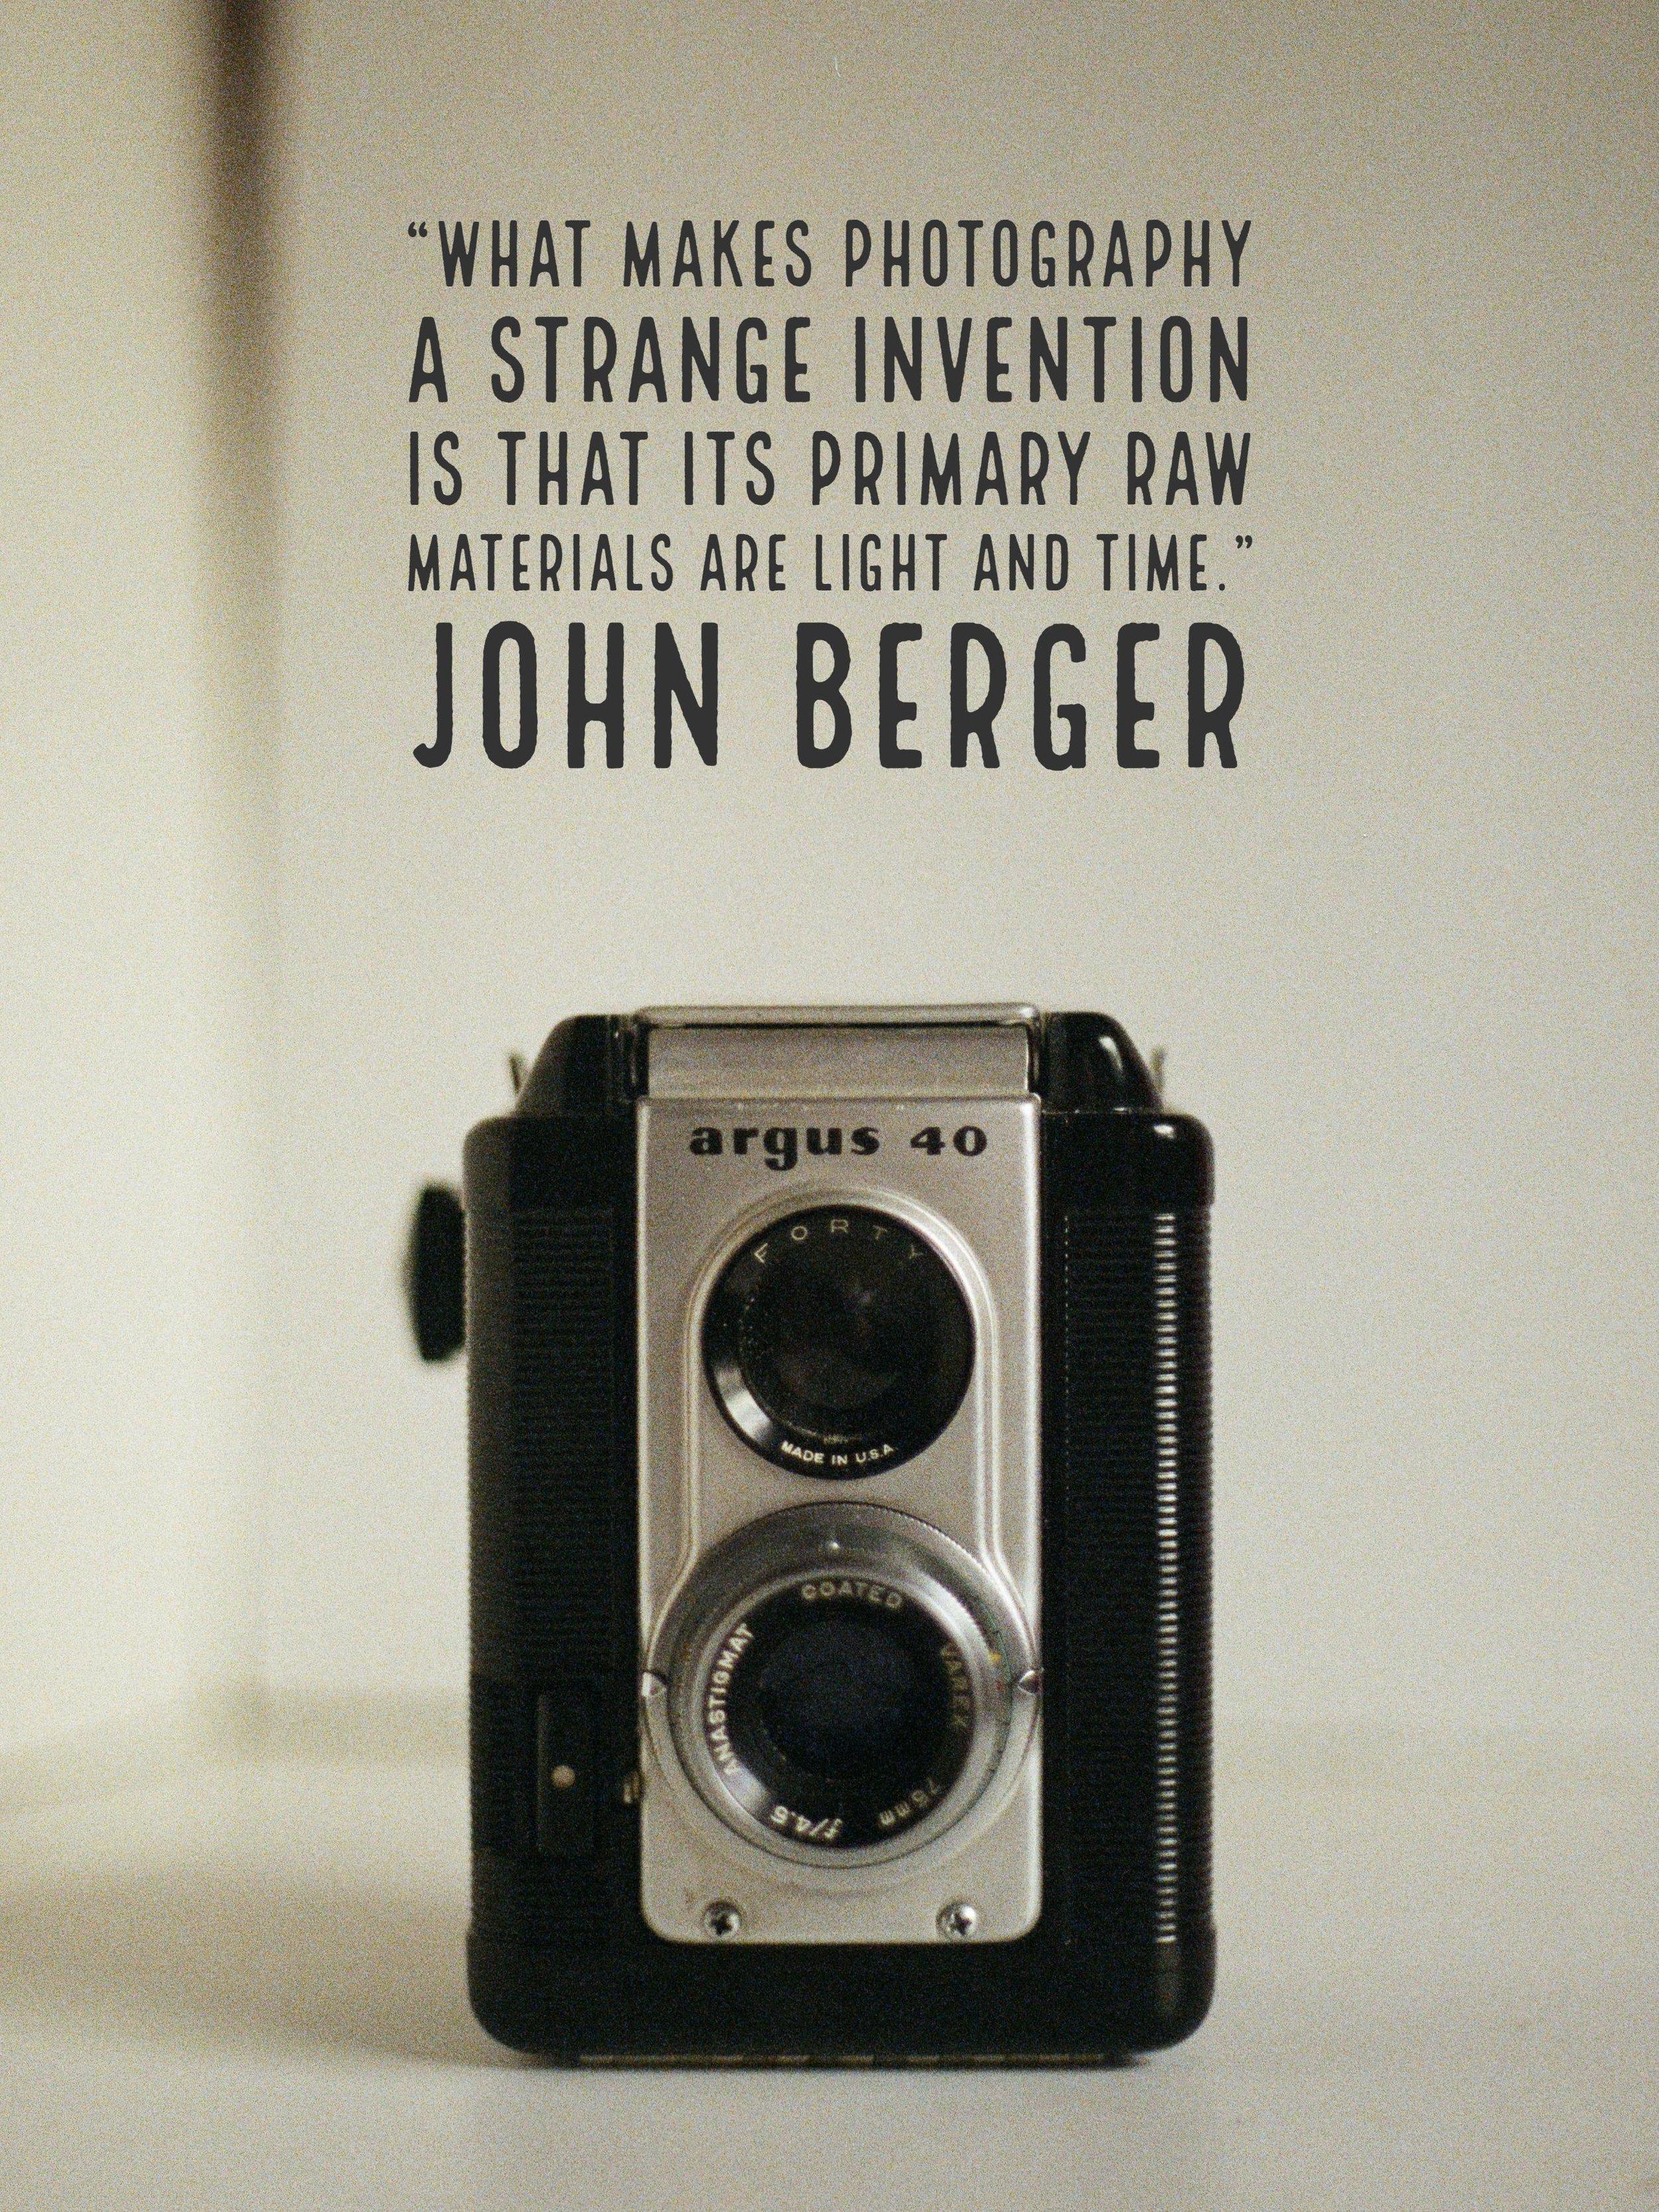 photography-quote-exposure-john-berger-raw-materials-light-time.jpg